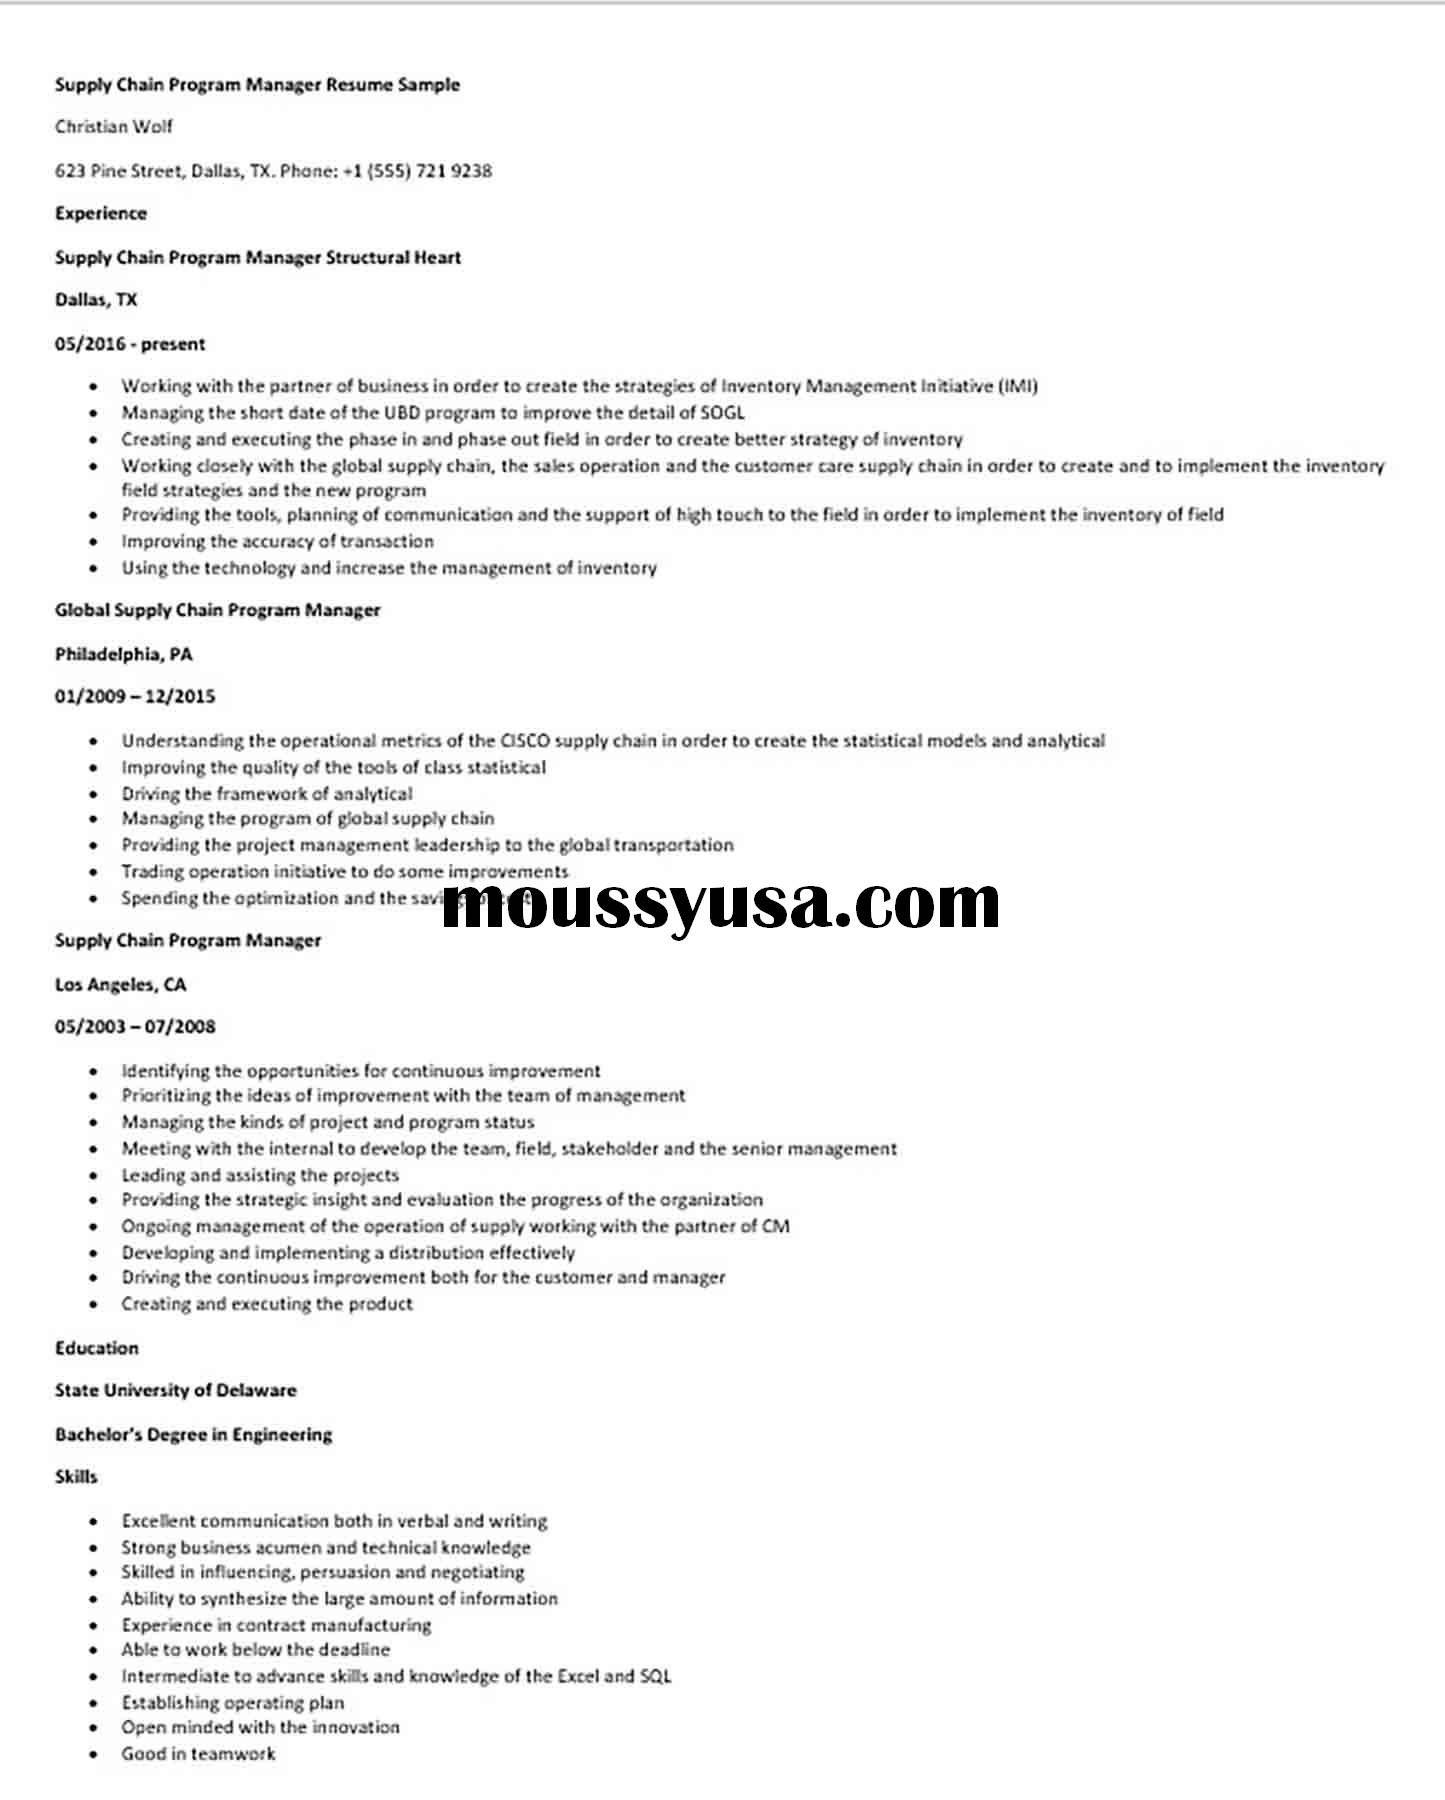 Supply Chain Program Manager Resume Sample Programme Manager Manager Resume Supply Chain